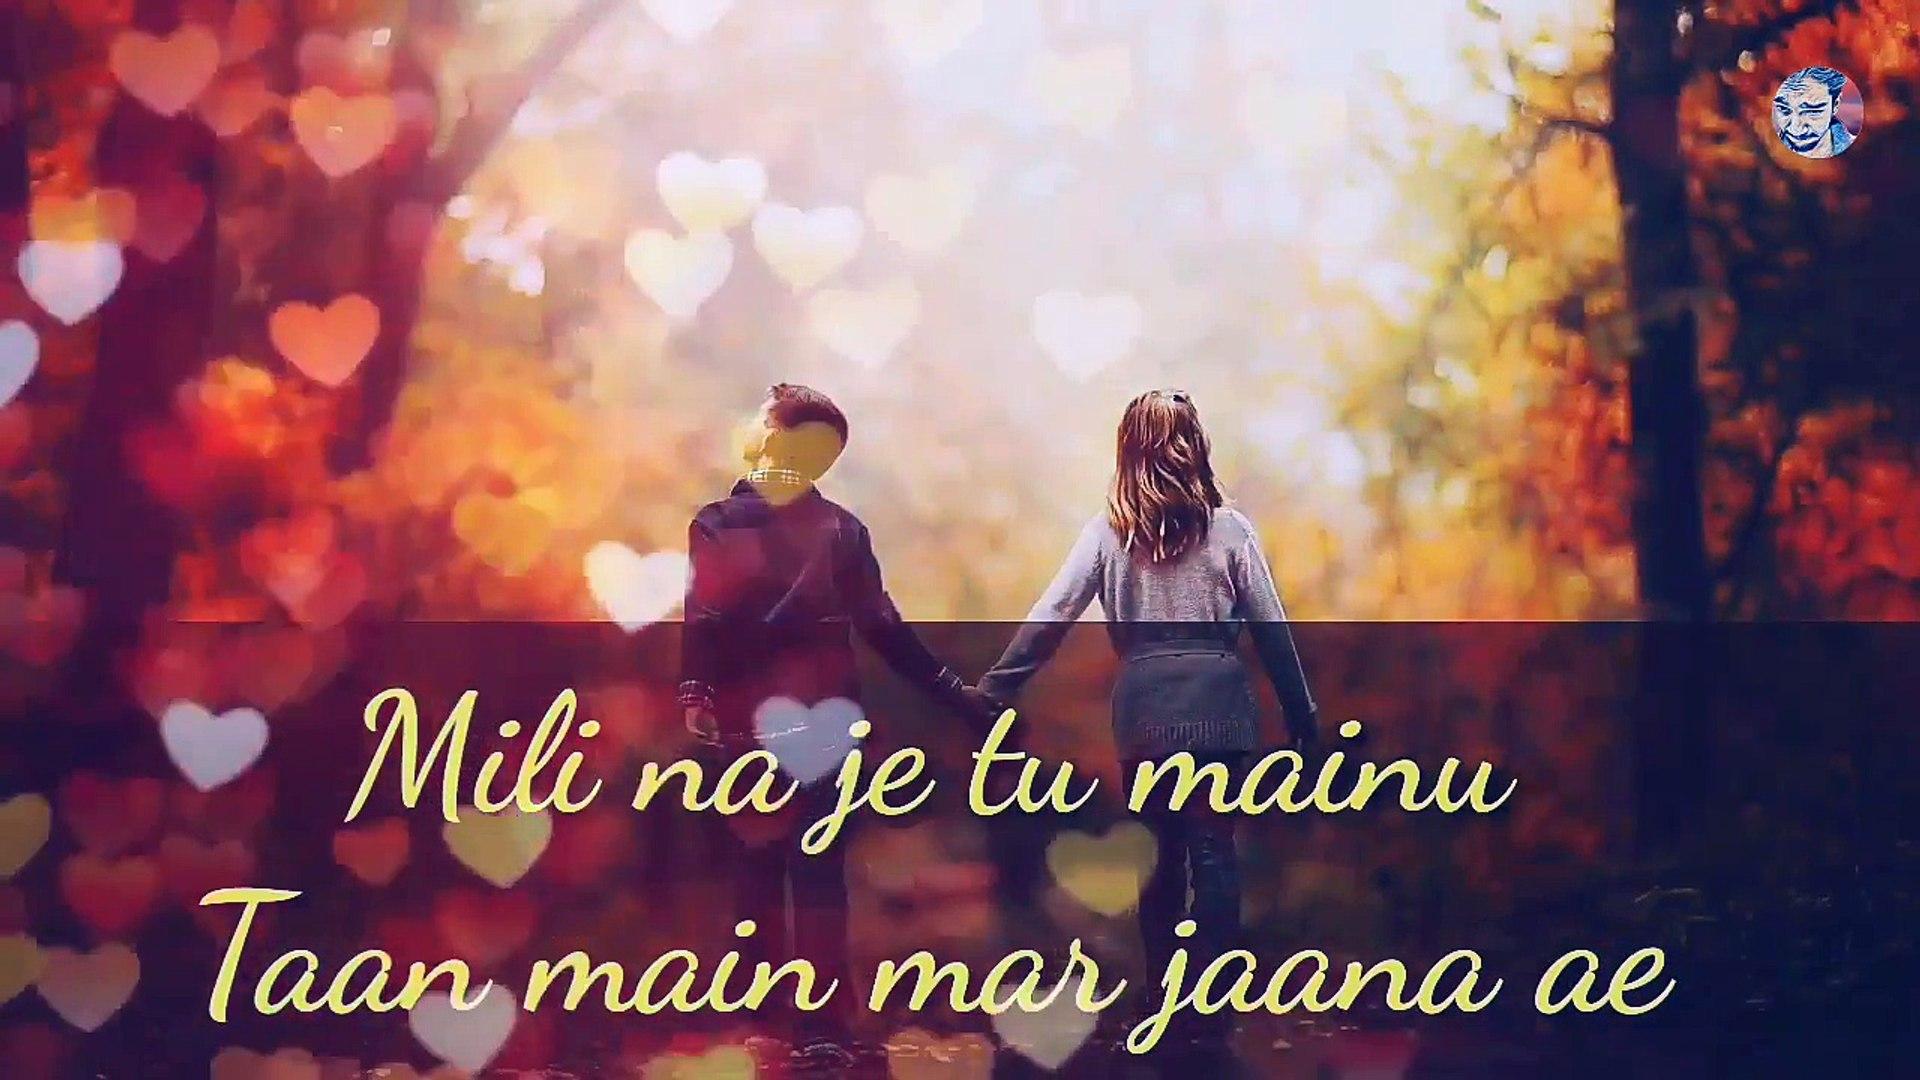 punjabi songs whatsapp lyrics video l 30 sec whatsapp status video l  whatsapp status video song